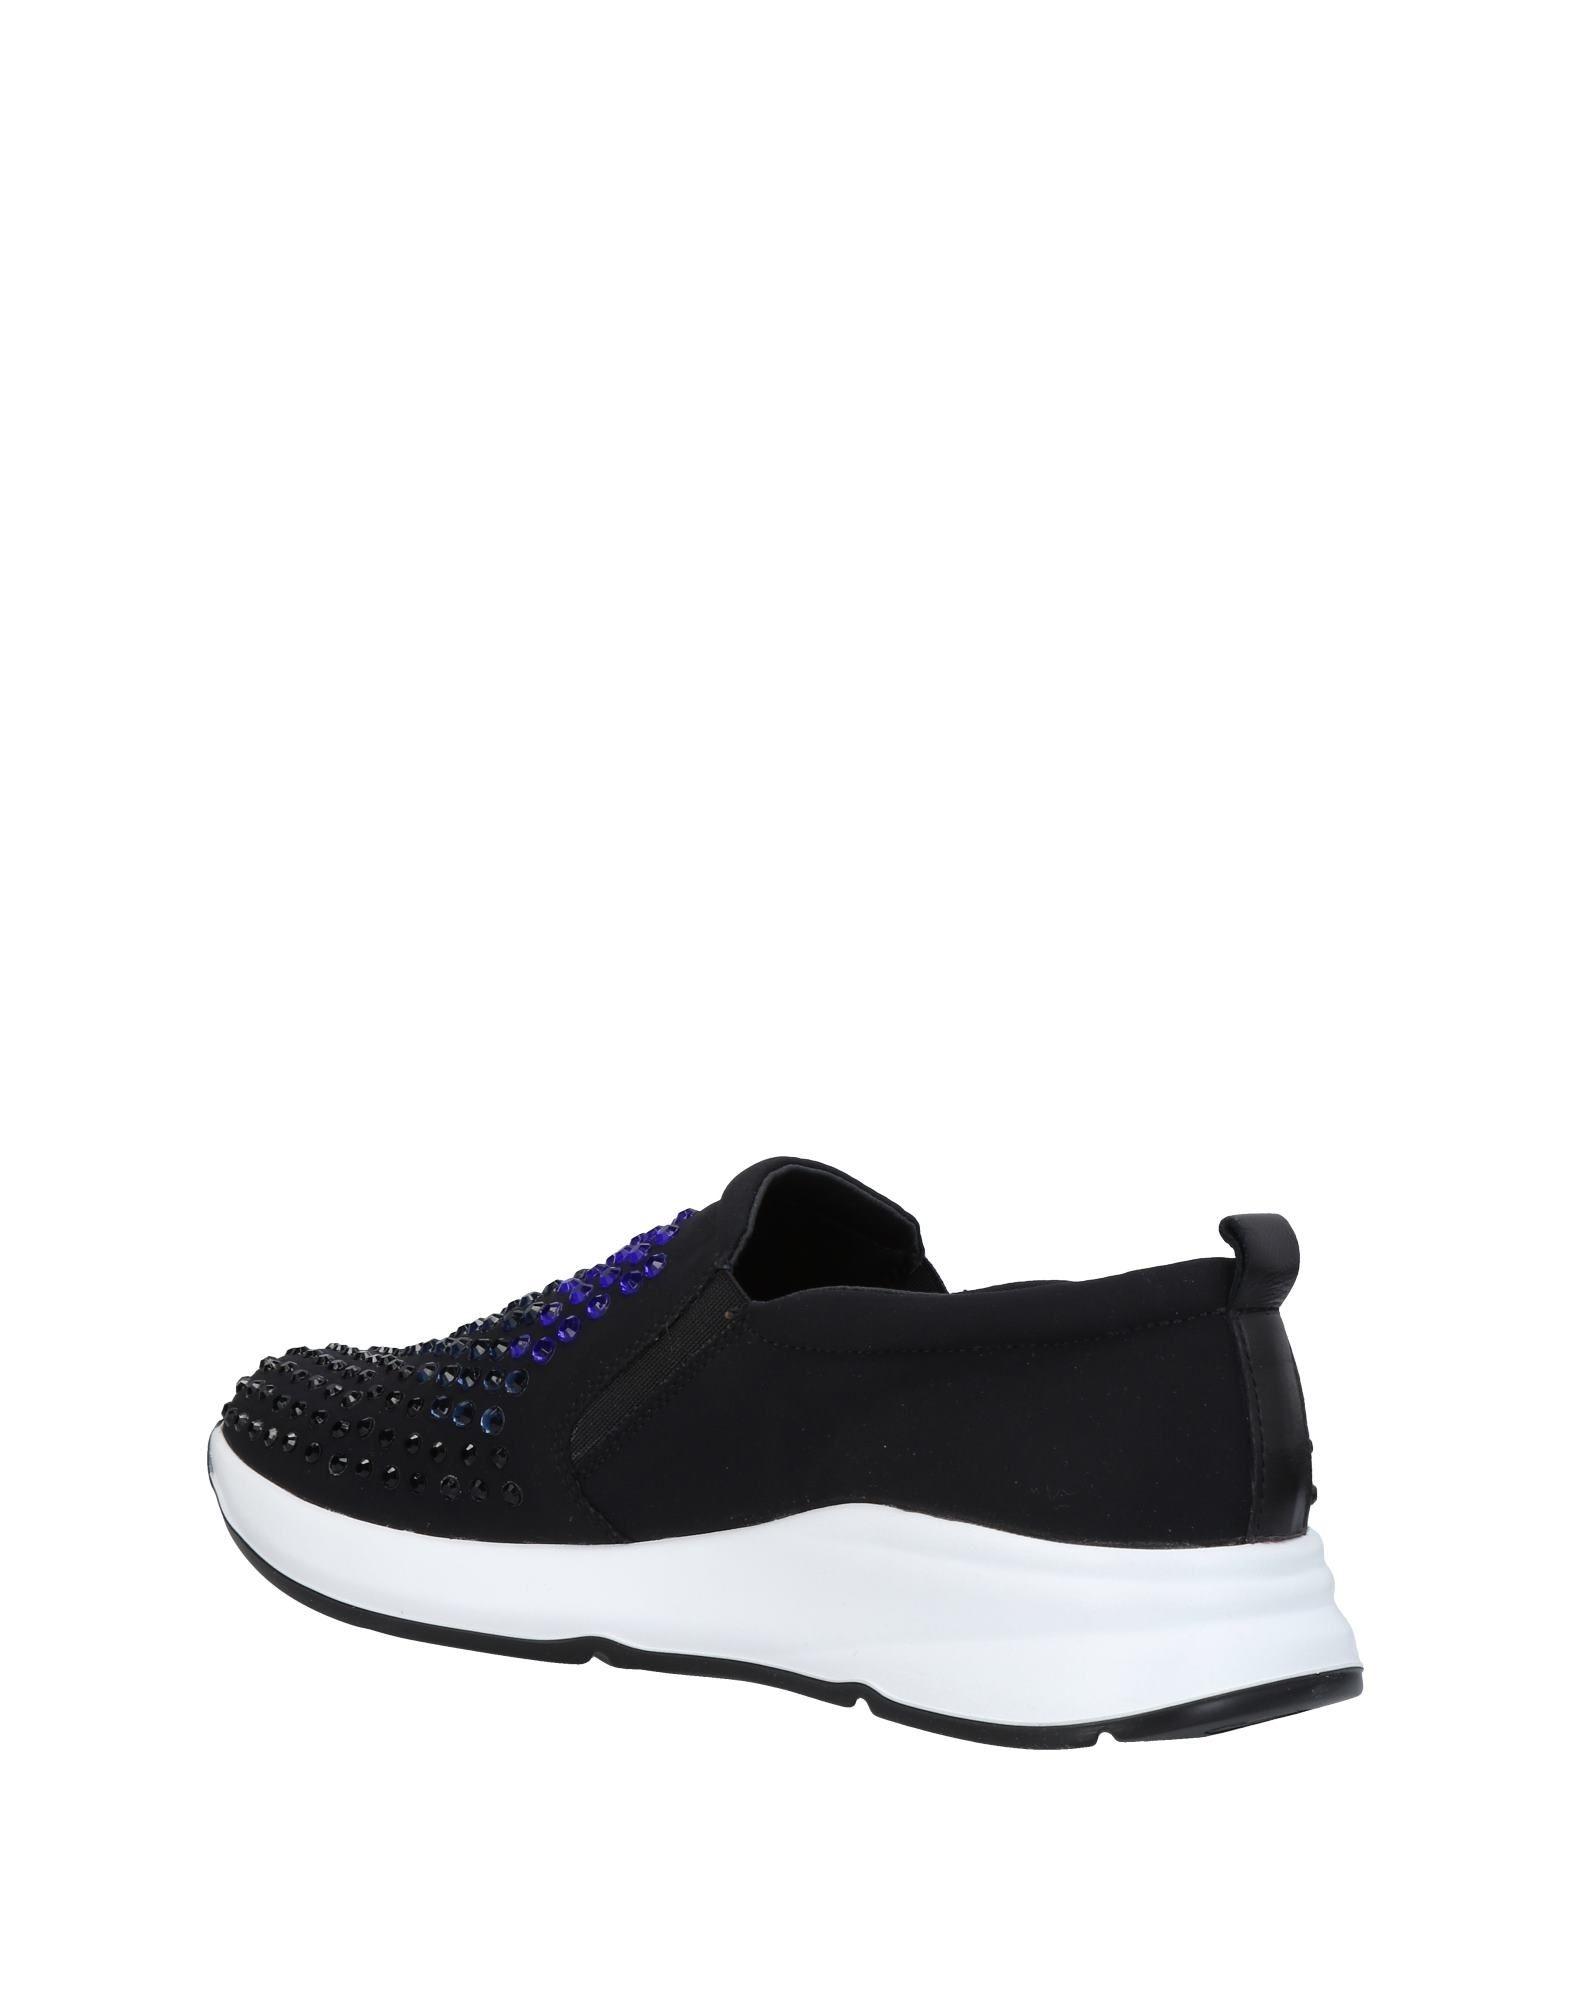 Tosca 11455300GE Blu Shoes Sneakers Damen  11455300GE Tosca Gute Qualität beliebte Schuhe dcda11